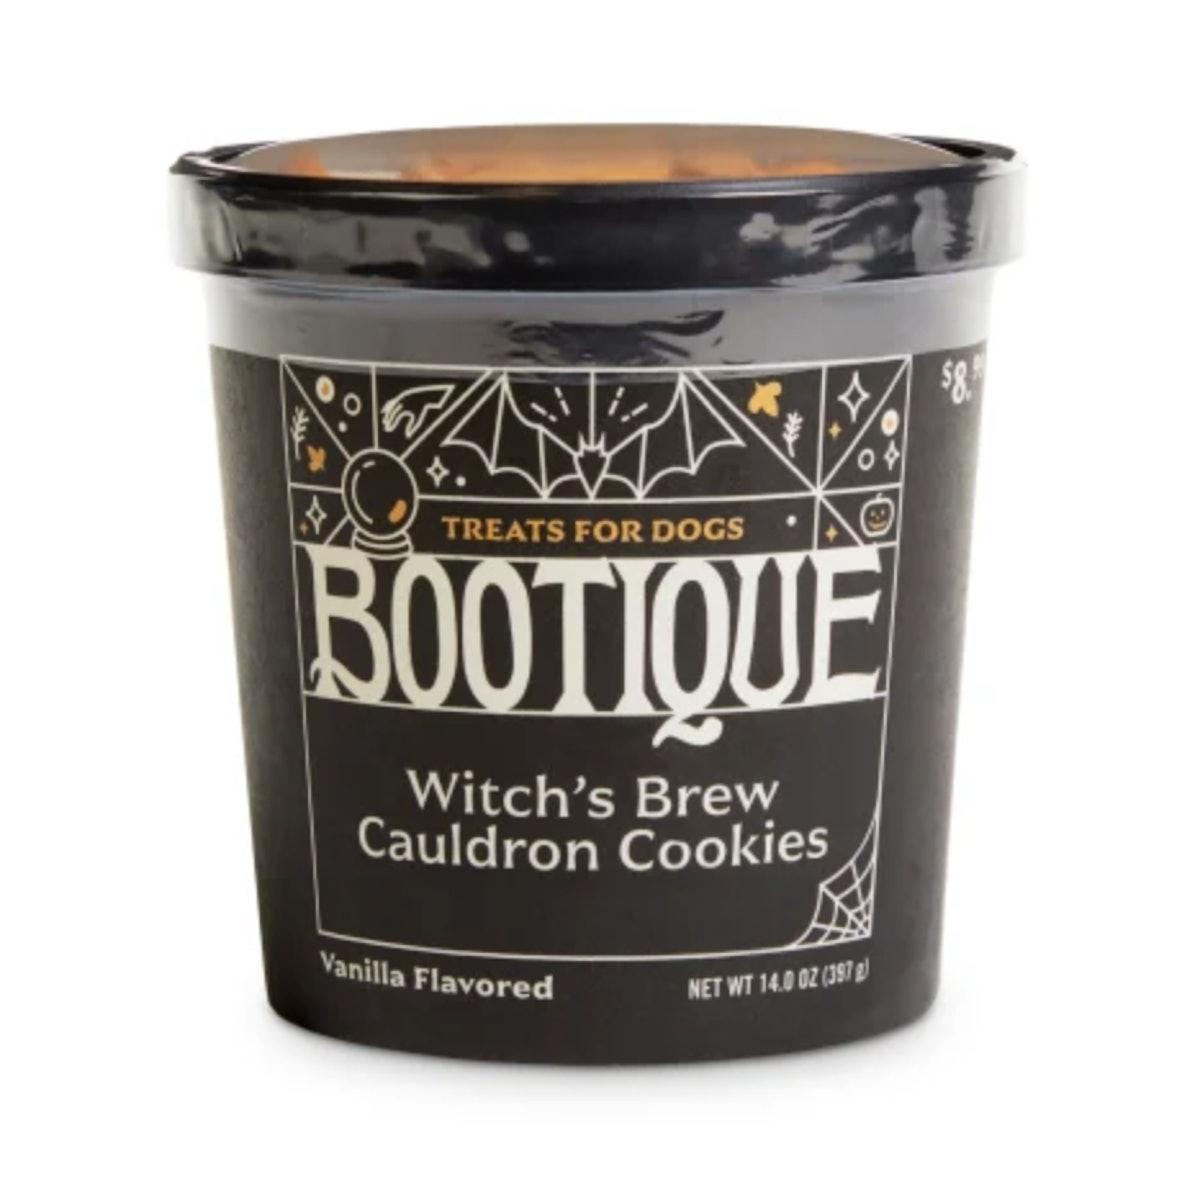 Bootique Witch's Brew Cauldron Cookies Carob & Vanilla-Flavored Halloween Dog Treats